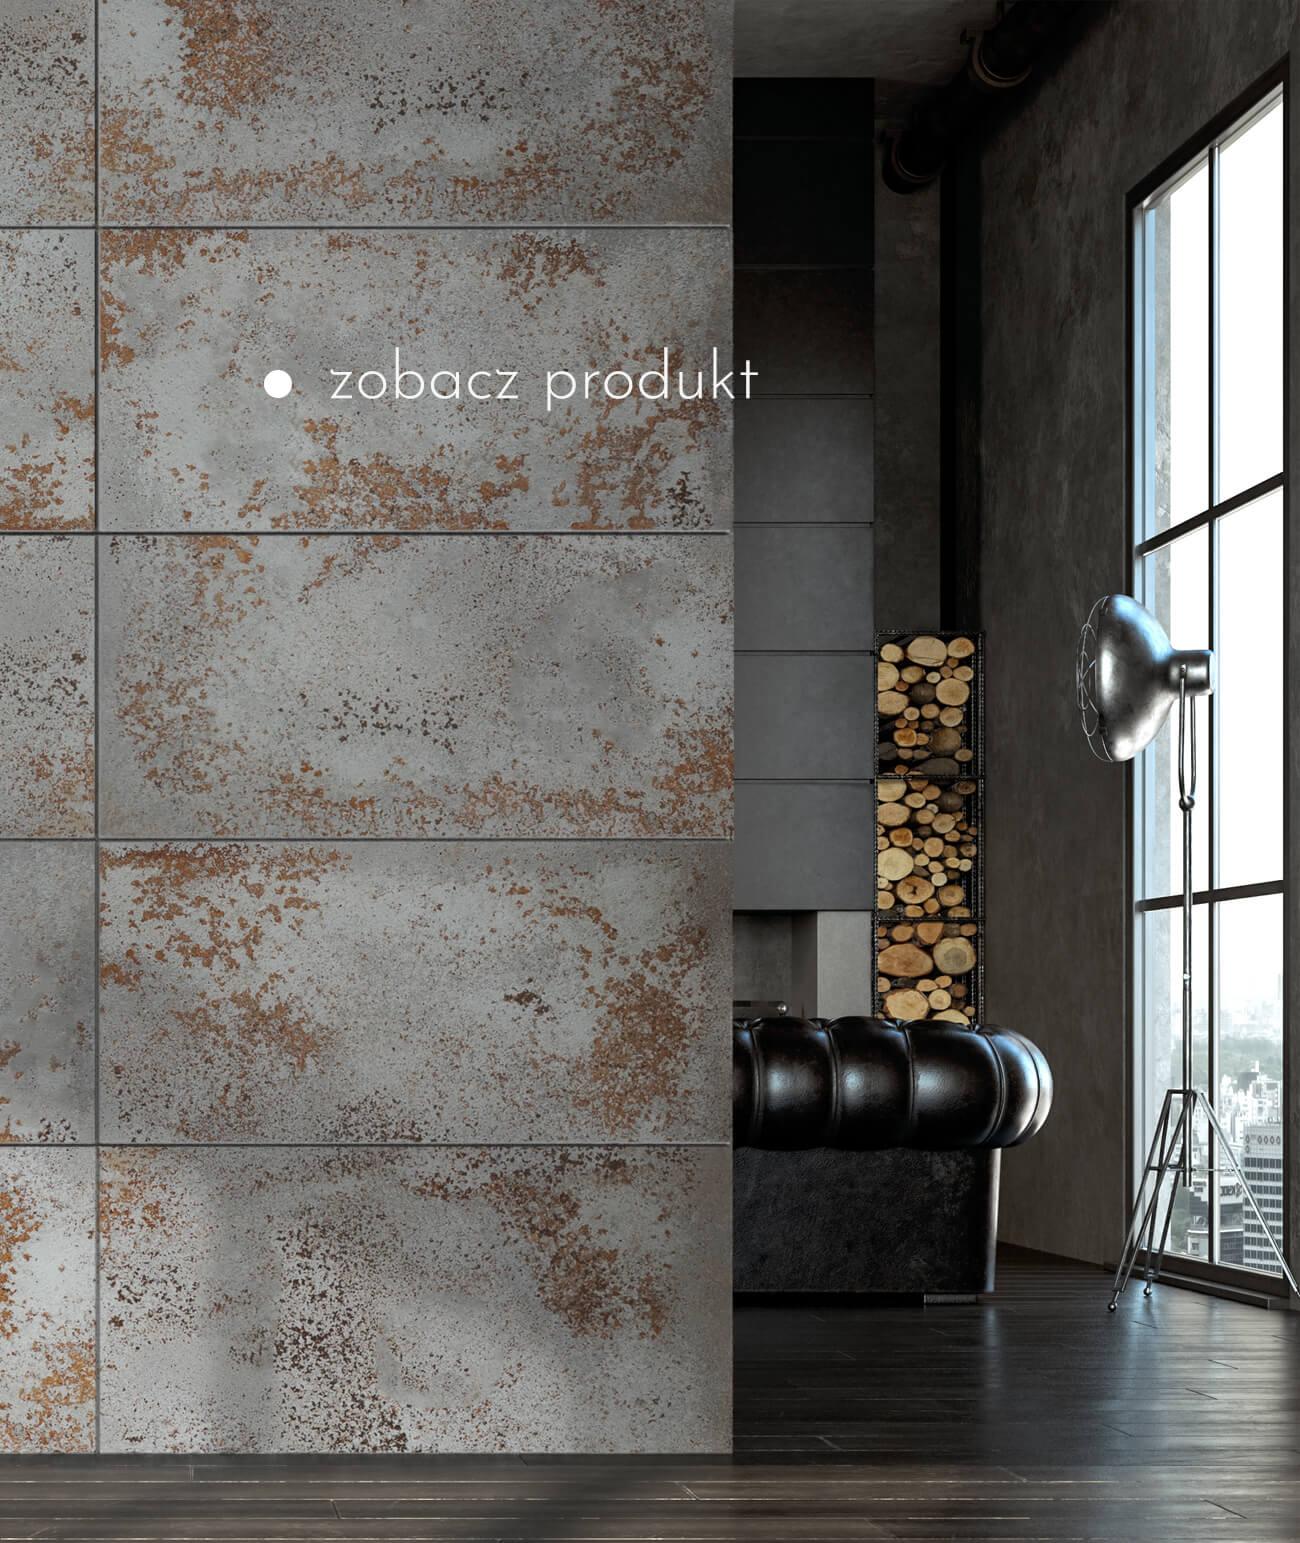 plyty-betonowe-scienne-i-elewacyjne-beton-architektoniczny_1123-24192-ds-szary-corten---plyta-beton-architektoniczny-grc-ultralekka-ultralekka